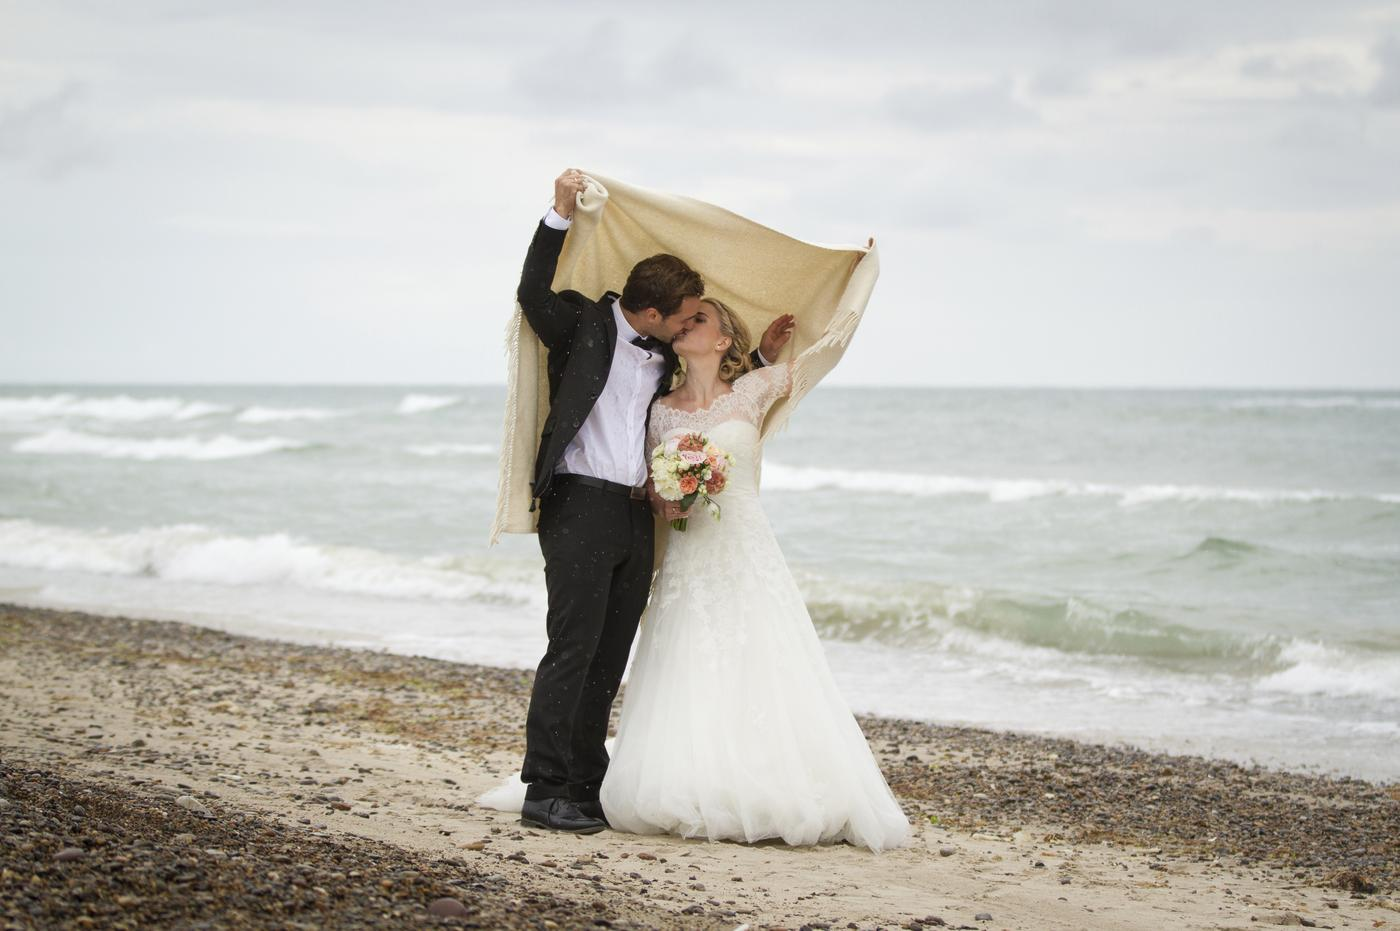 Winter weddings: 21 ideas for the perfect winter wonderland wedding